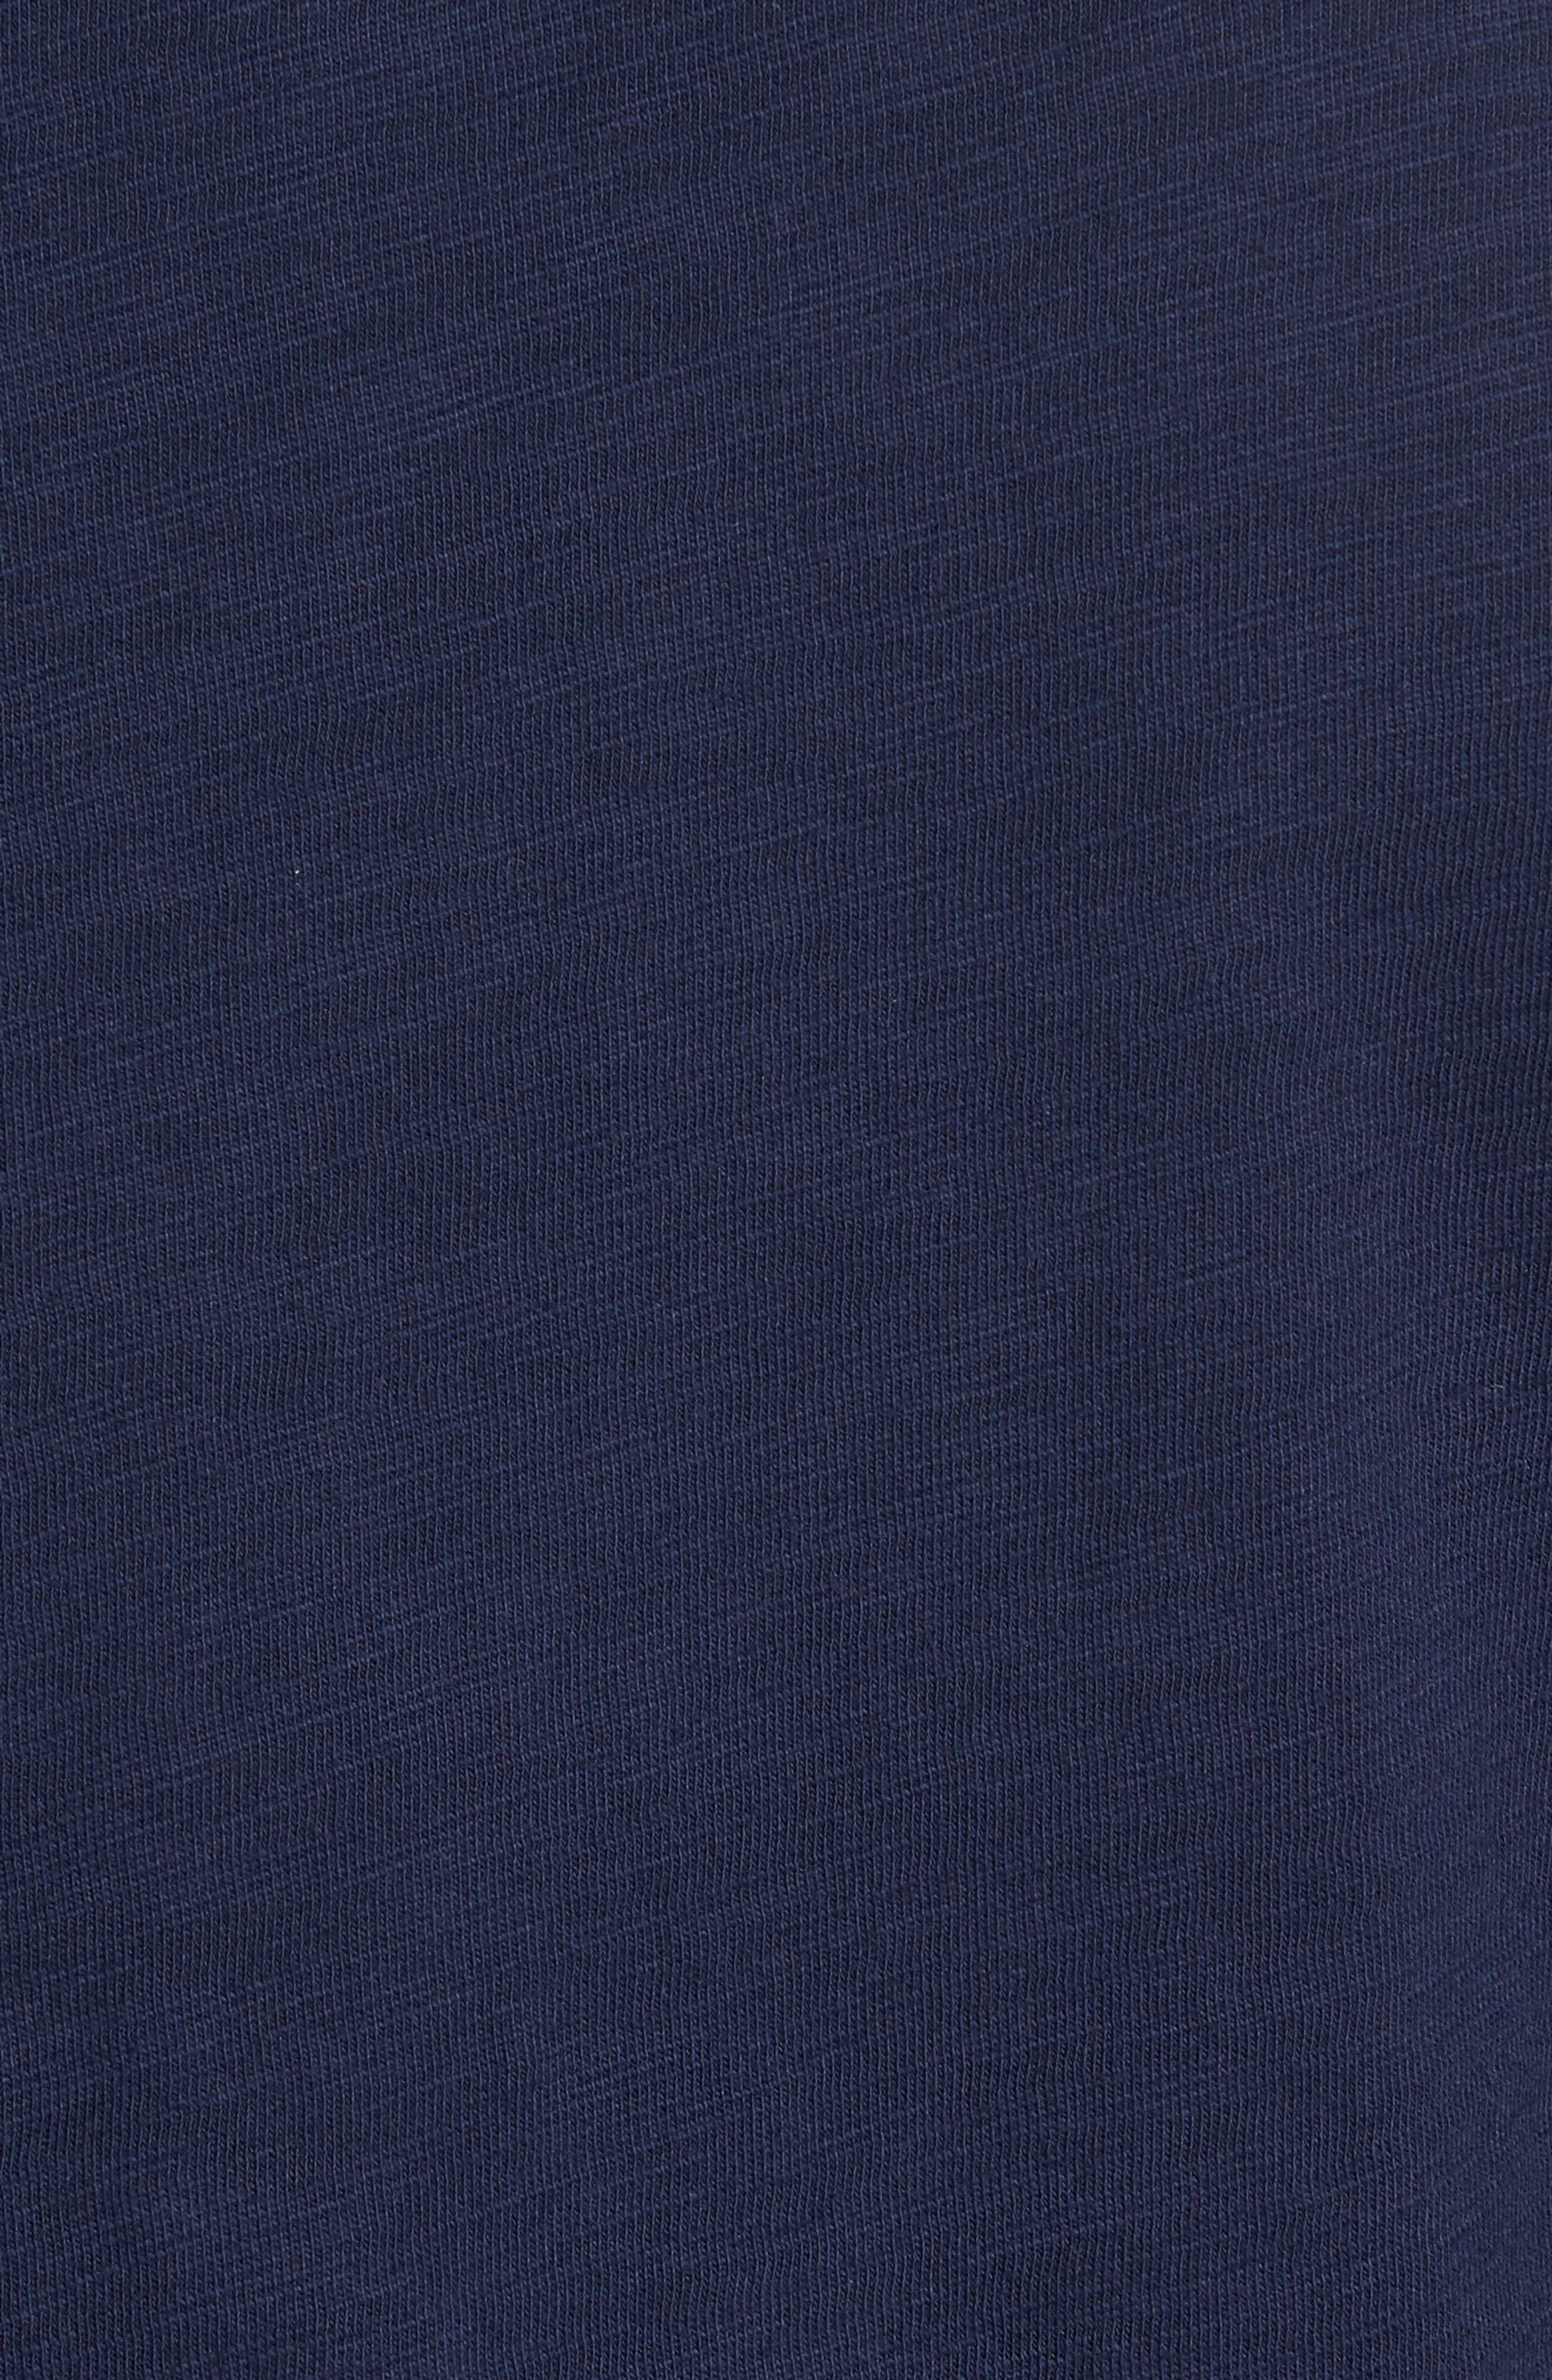 Gulf Stream Sweatshirt,                             Alternate thumbnail 5, color,                             408